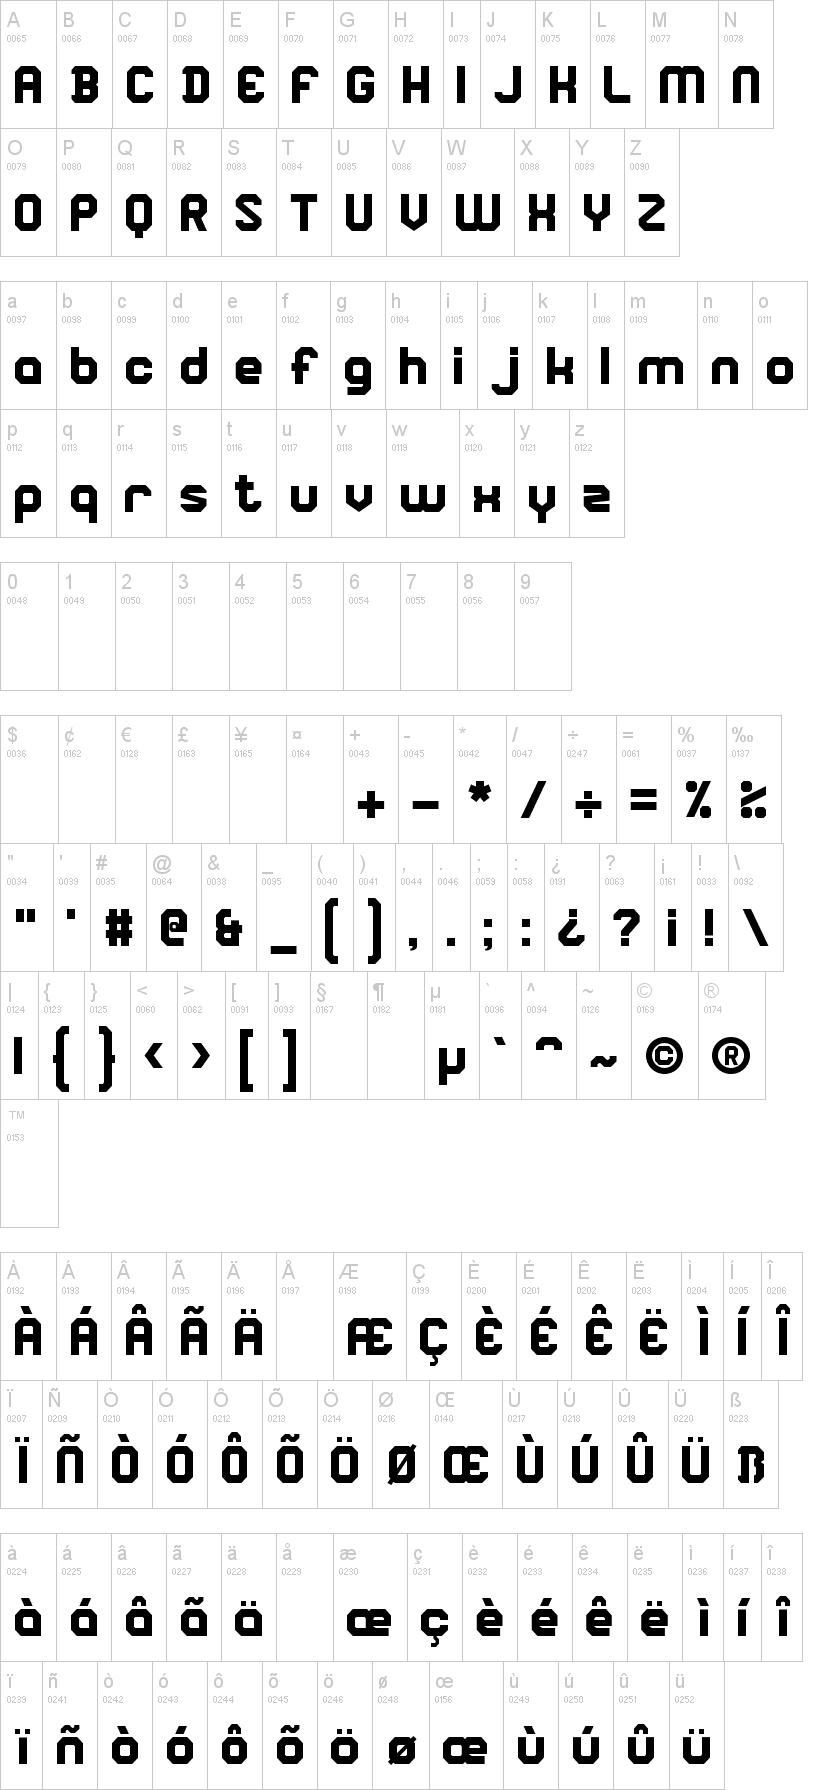 Square Block Font  DafontCom